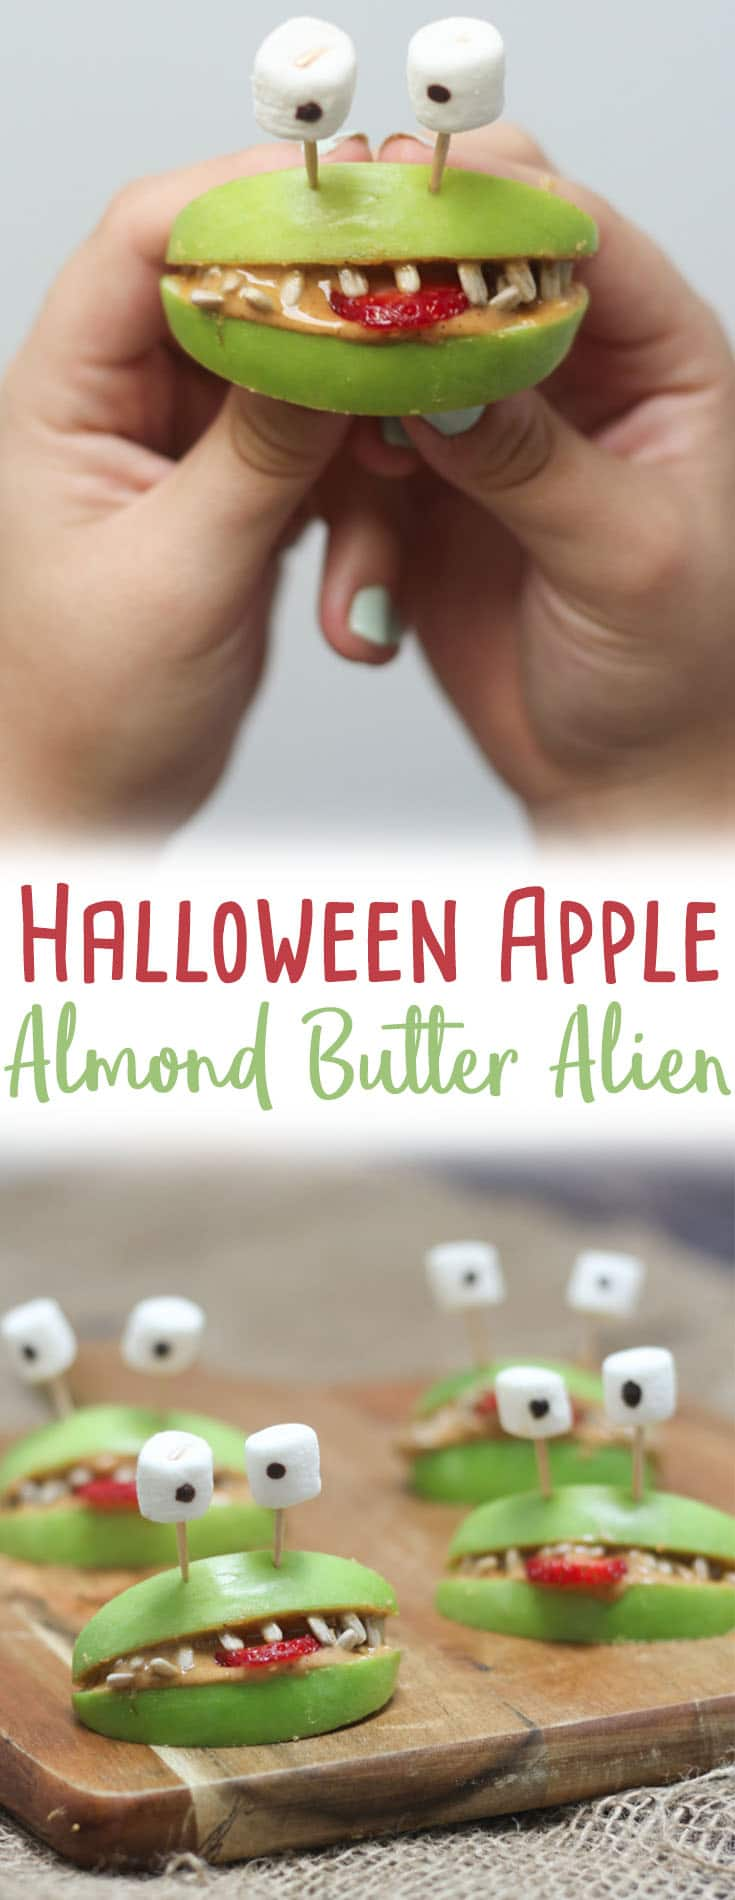 "Pinterest image of Halloween apple alien smiles with marshmallow eyes with the overlay text \""Halloween Apple Almond Butter Alien.\"""